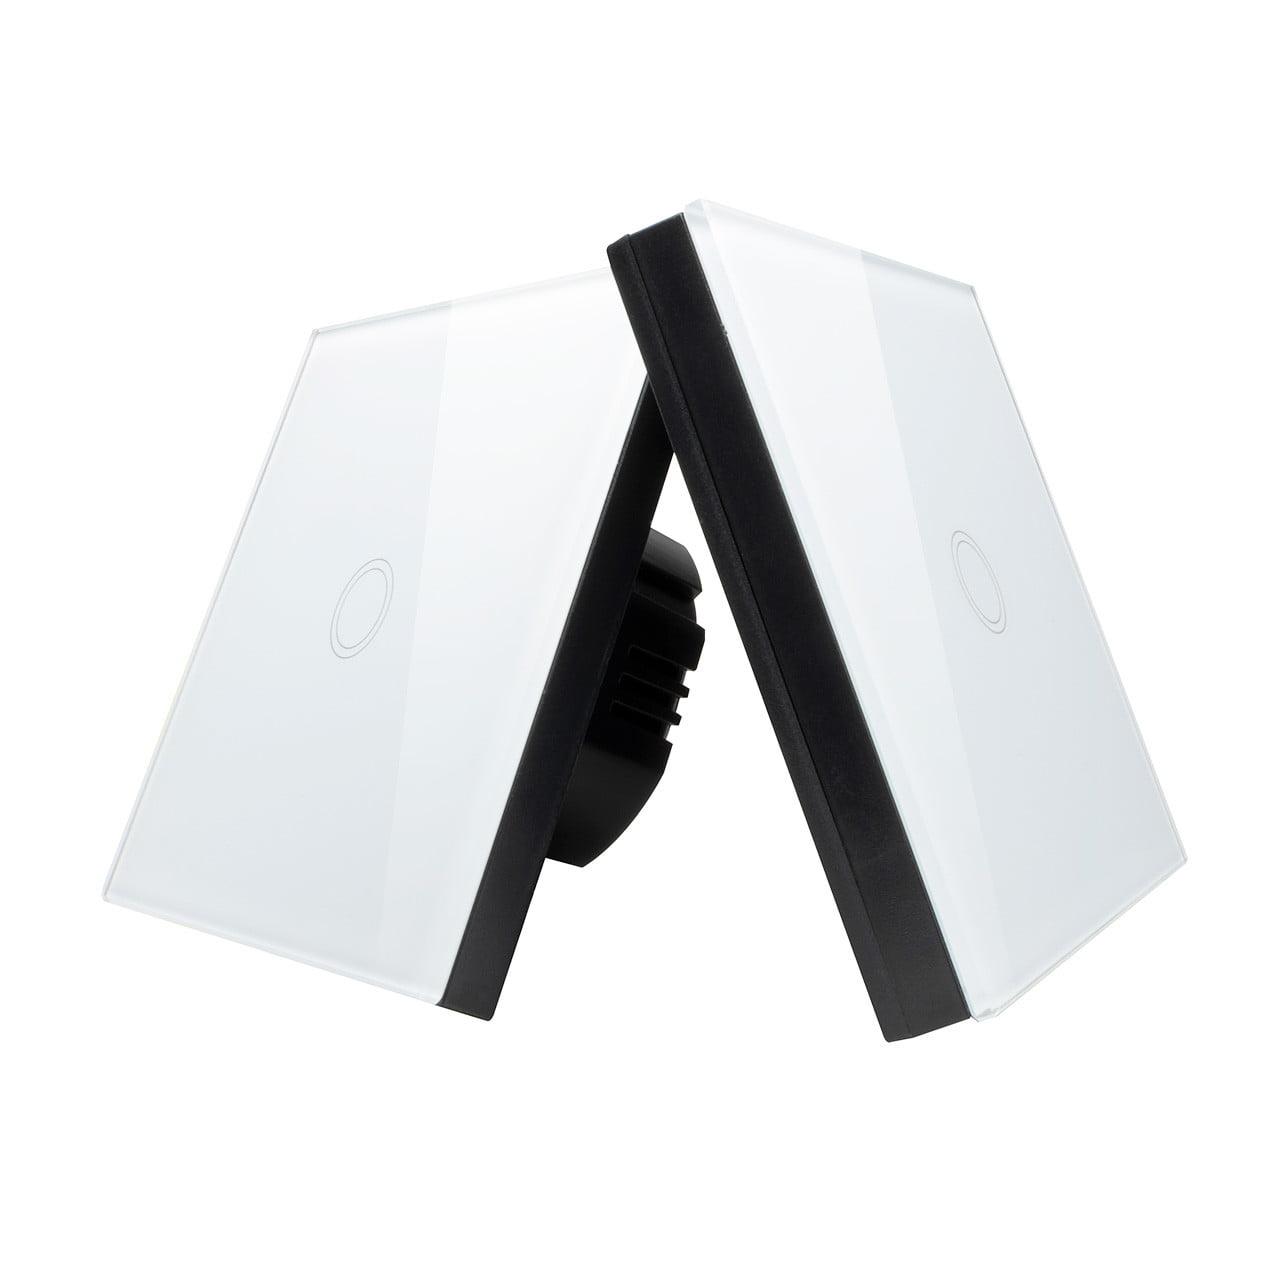 Intrerupator Wireless RF cu touch, panou tactil de sticla si telecomanda tip panou